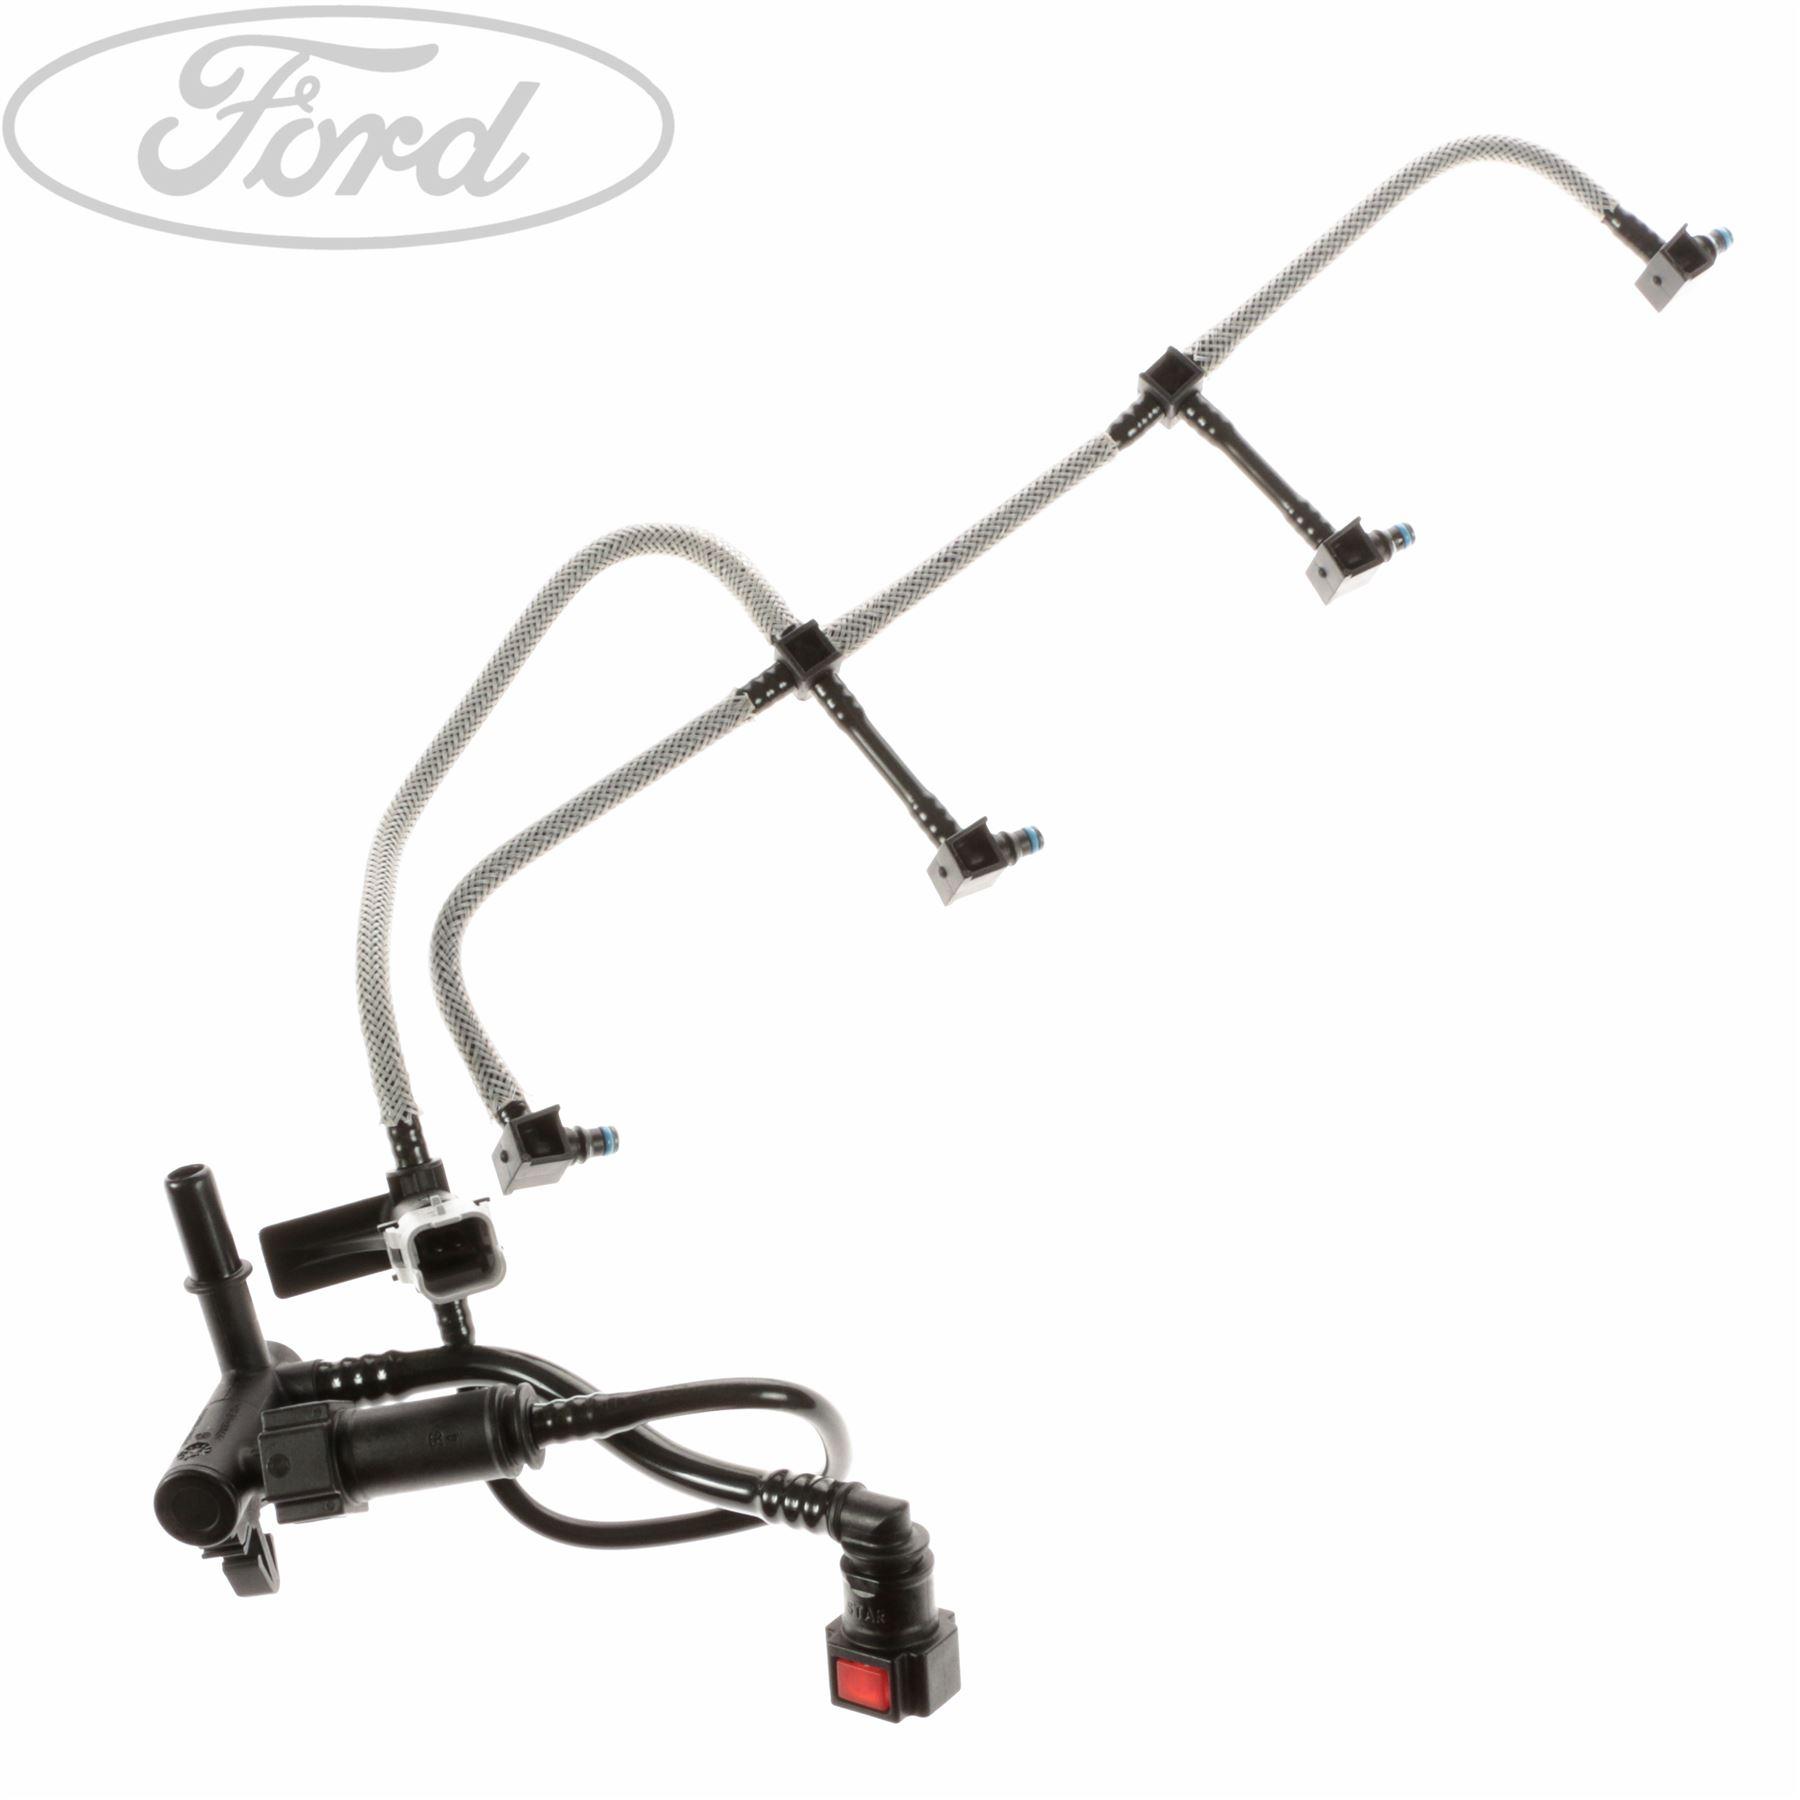 Genuine Ford Fuel Injector Pipe Repair Tube